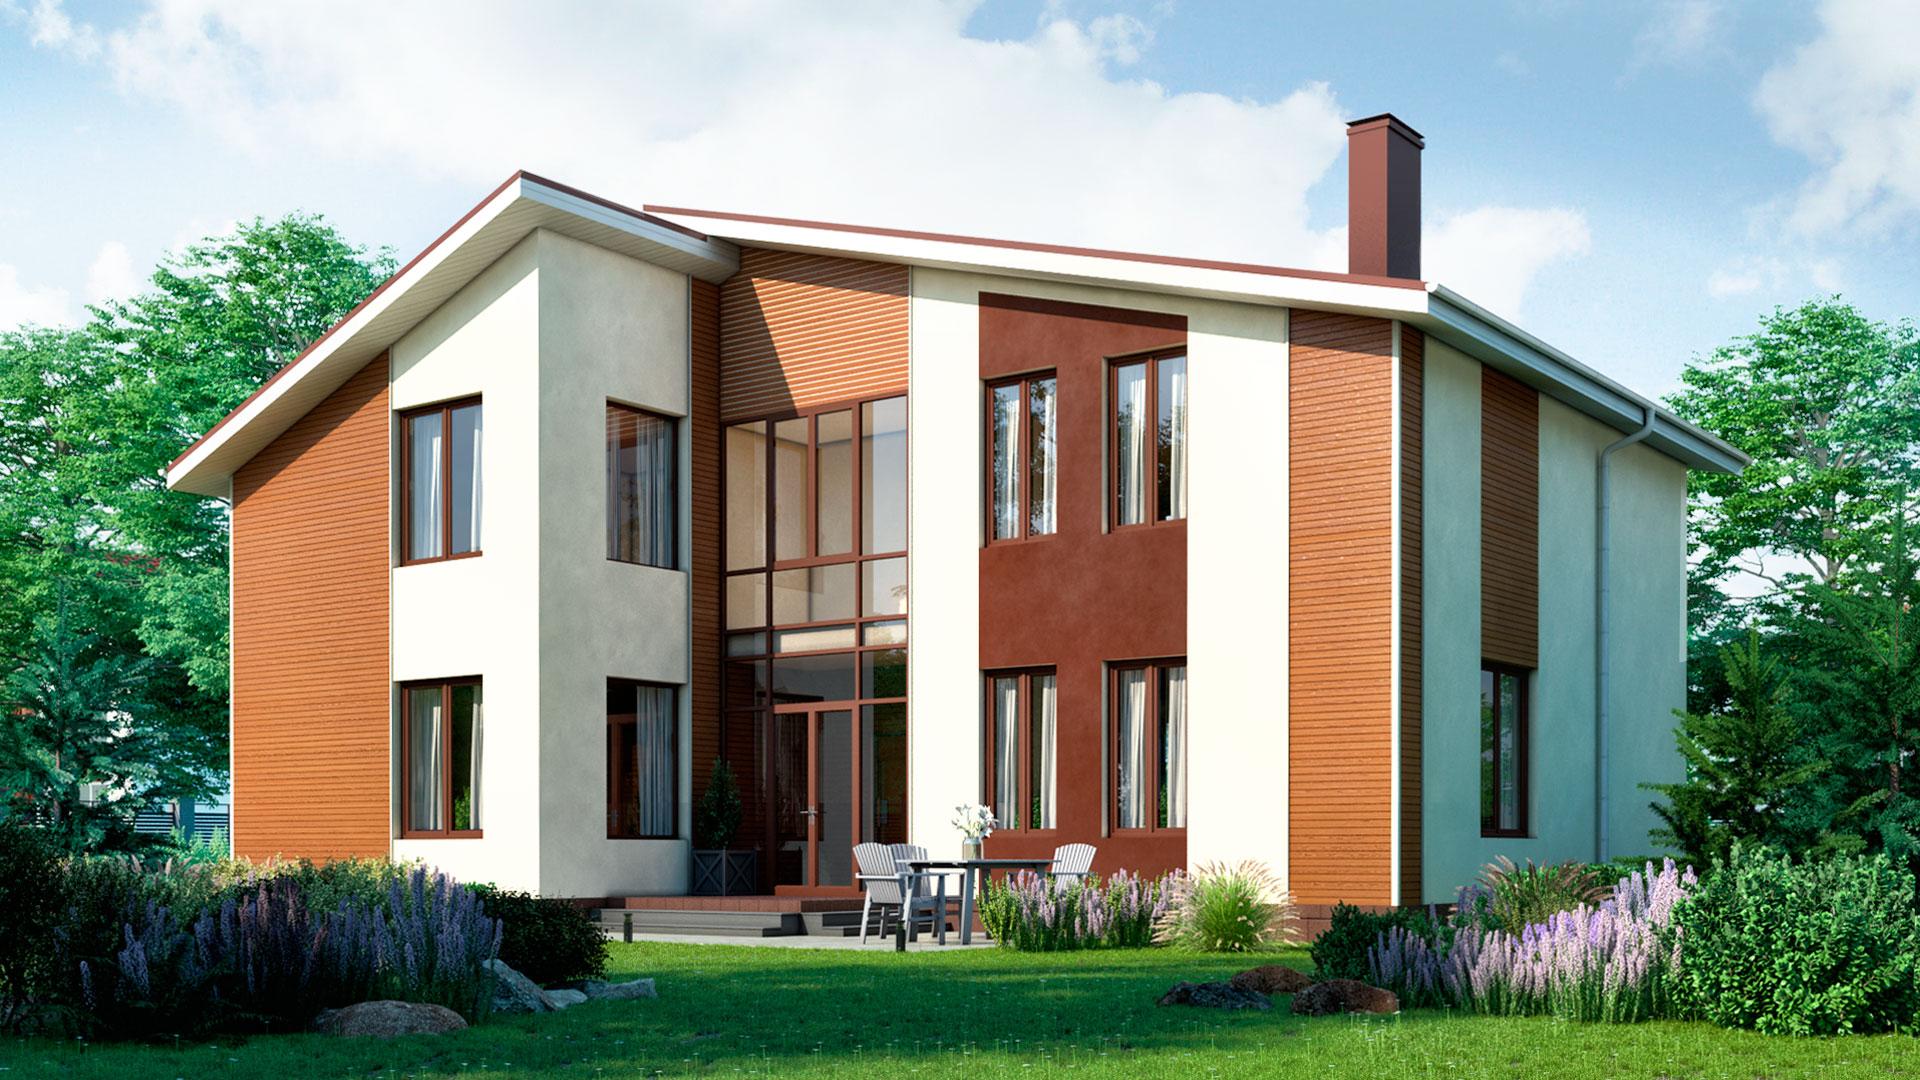 Задний фасад двухэтажного загородного коттеджа, проект БЭНПАН БП-296/4.